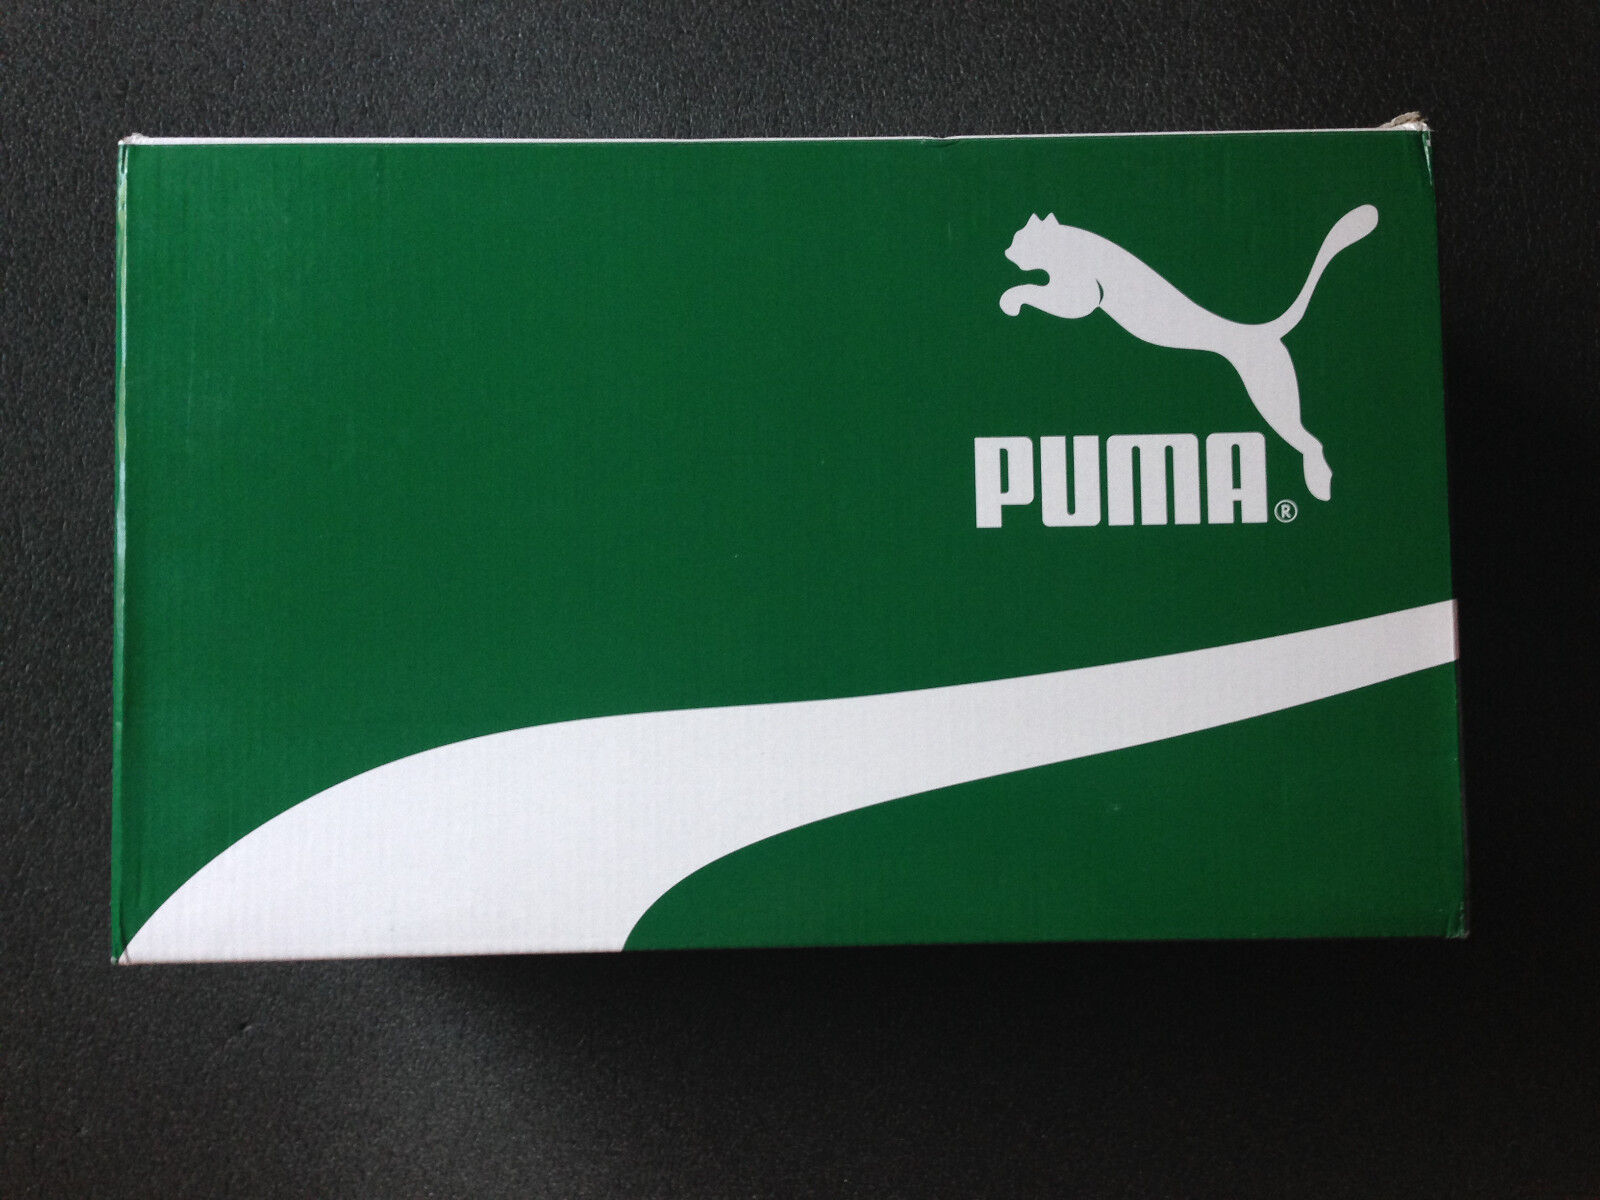 � Puma RS-100 PC R-SYSTEM vintage colourway neu 11 new US 12 UK 11 neu EUR 46 CM 30 � 351e53